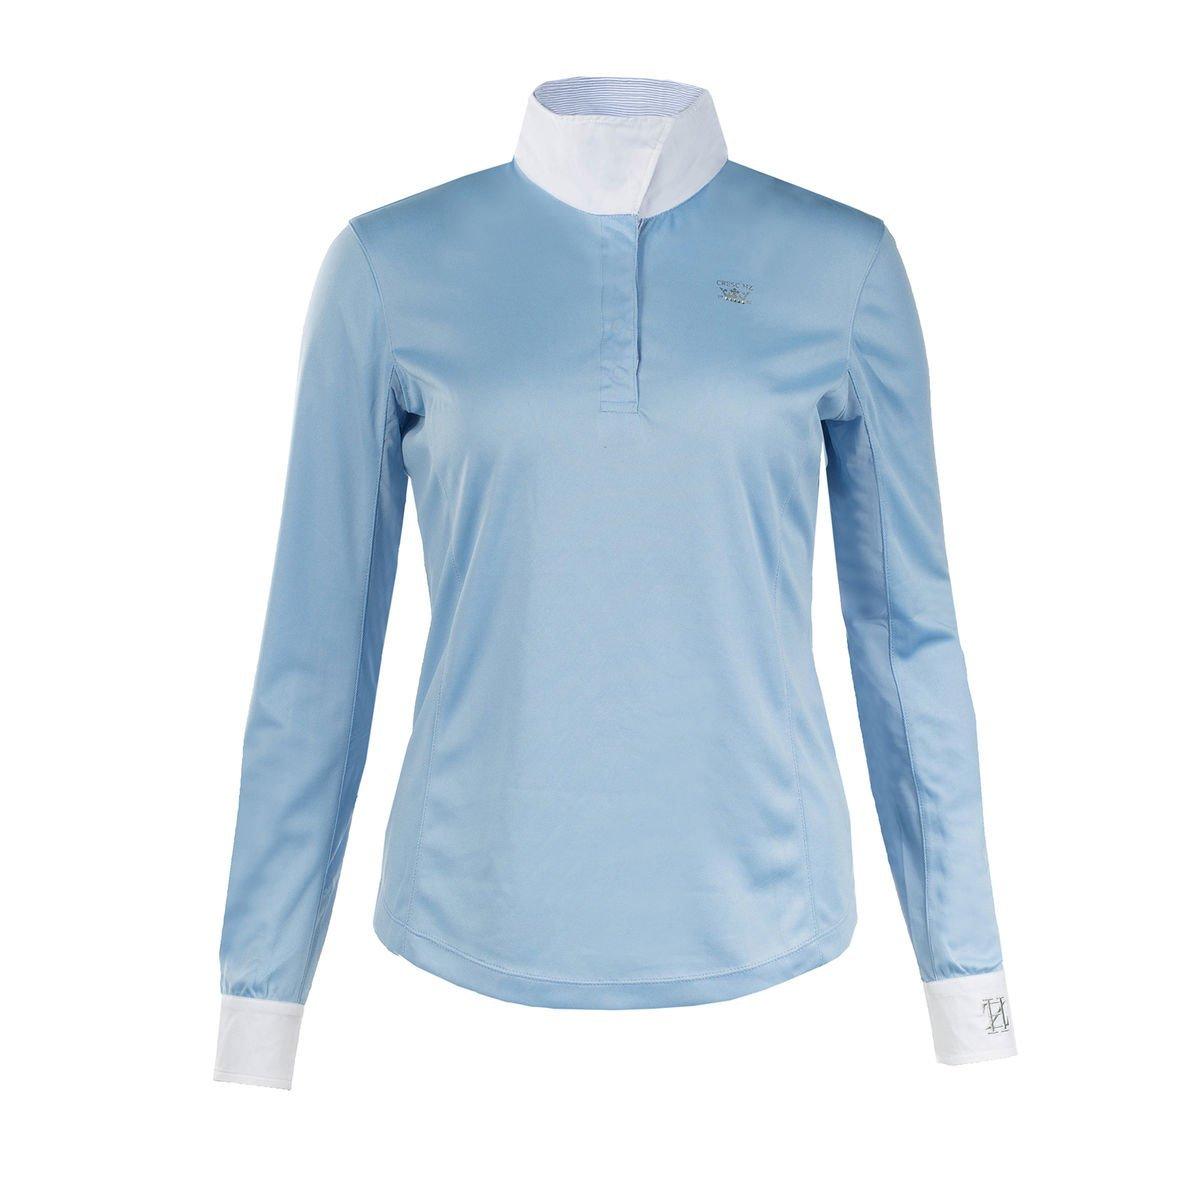 Horze Blaire Ladies UV Ice Fit Long Sleeve Show Shirt, Blue, 14